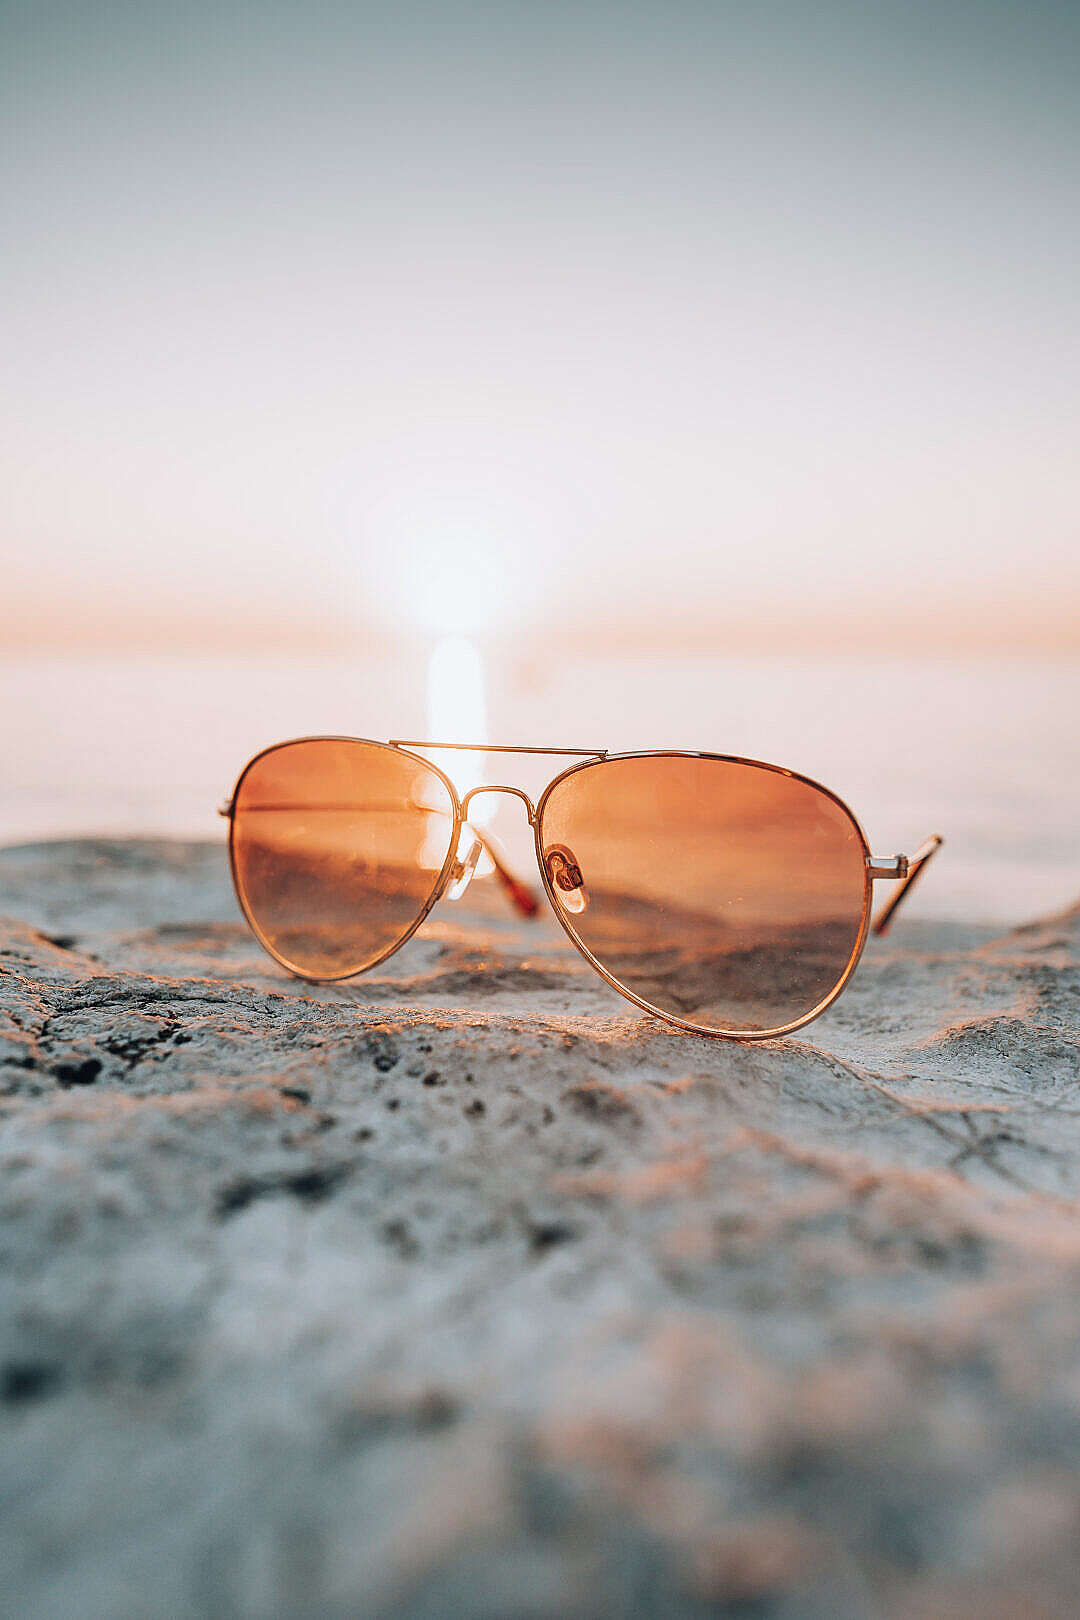 Download Fashion Sunglasses Sea Sunset and Stone FREE Stock Photo